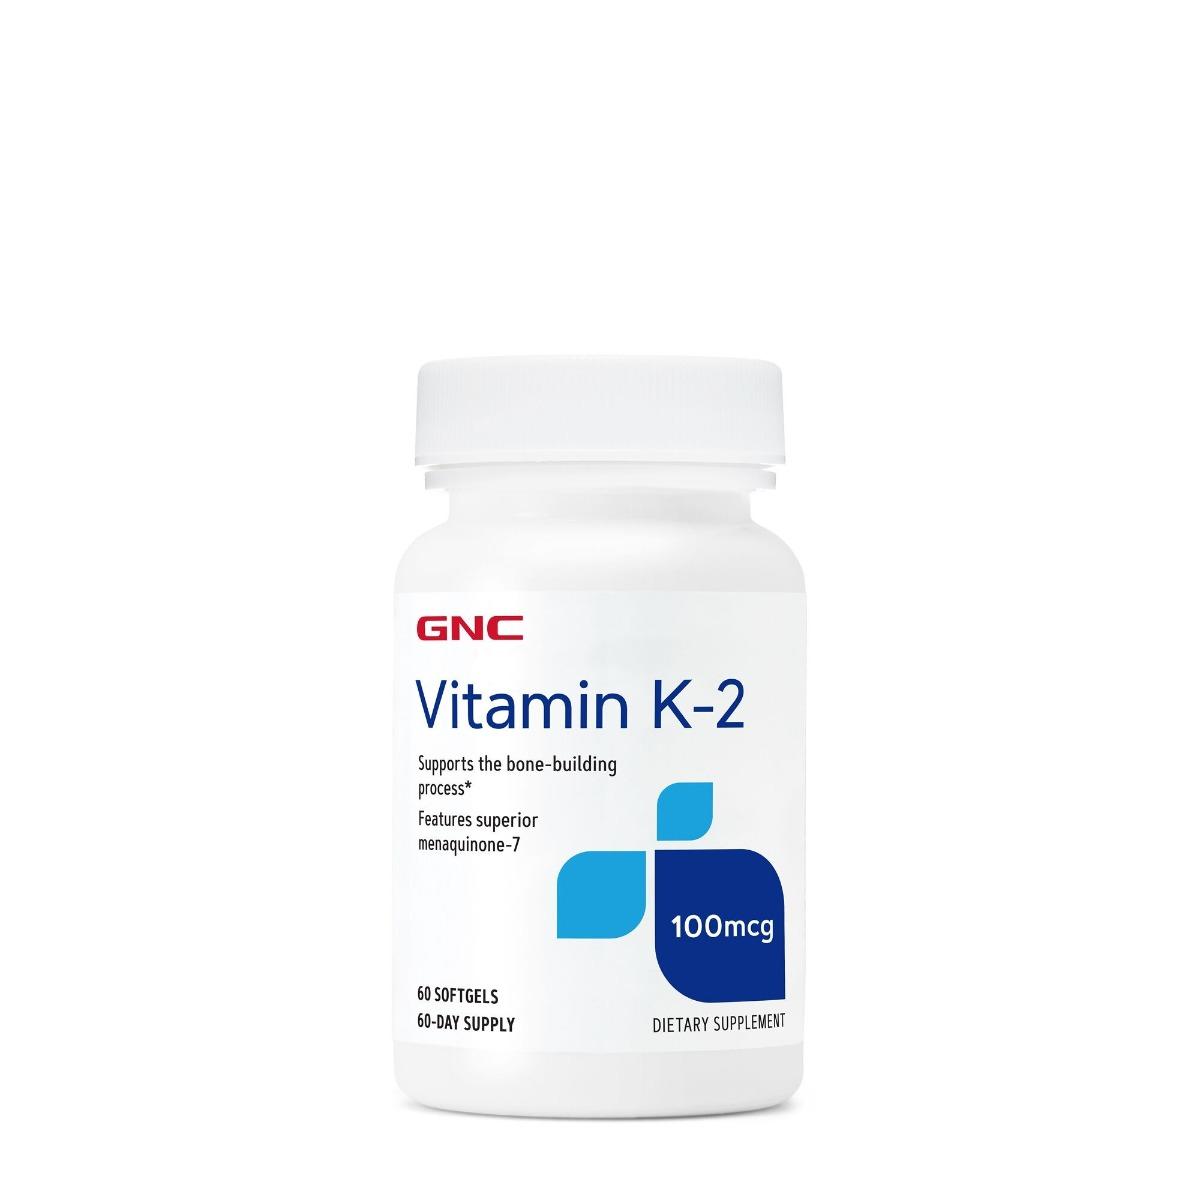 Vitamina K2 100Mcg, 60 capsule gelatinoase moi, GNC drmax poza